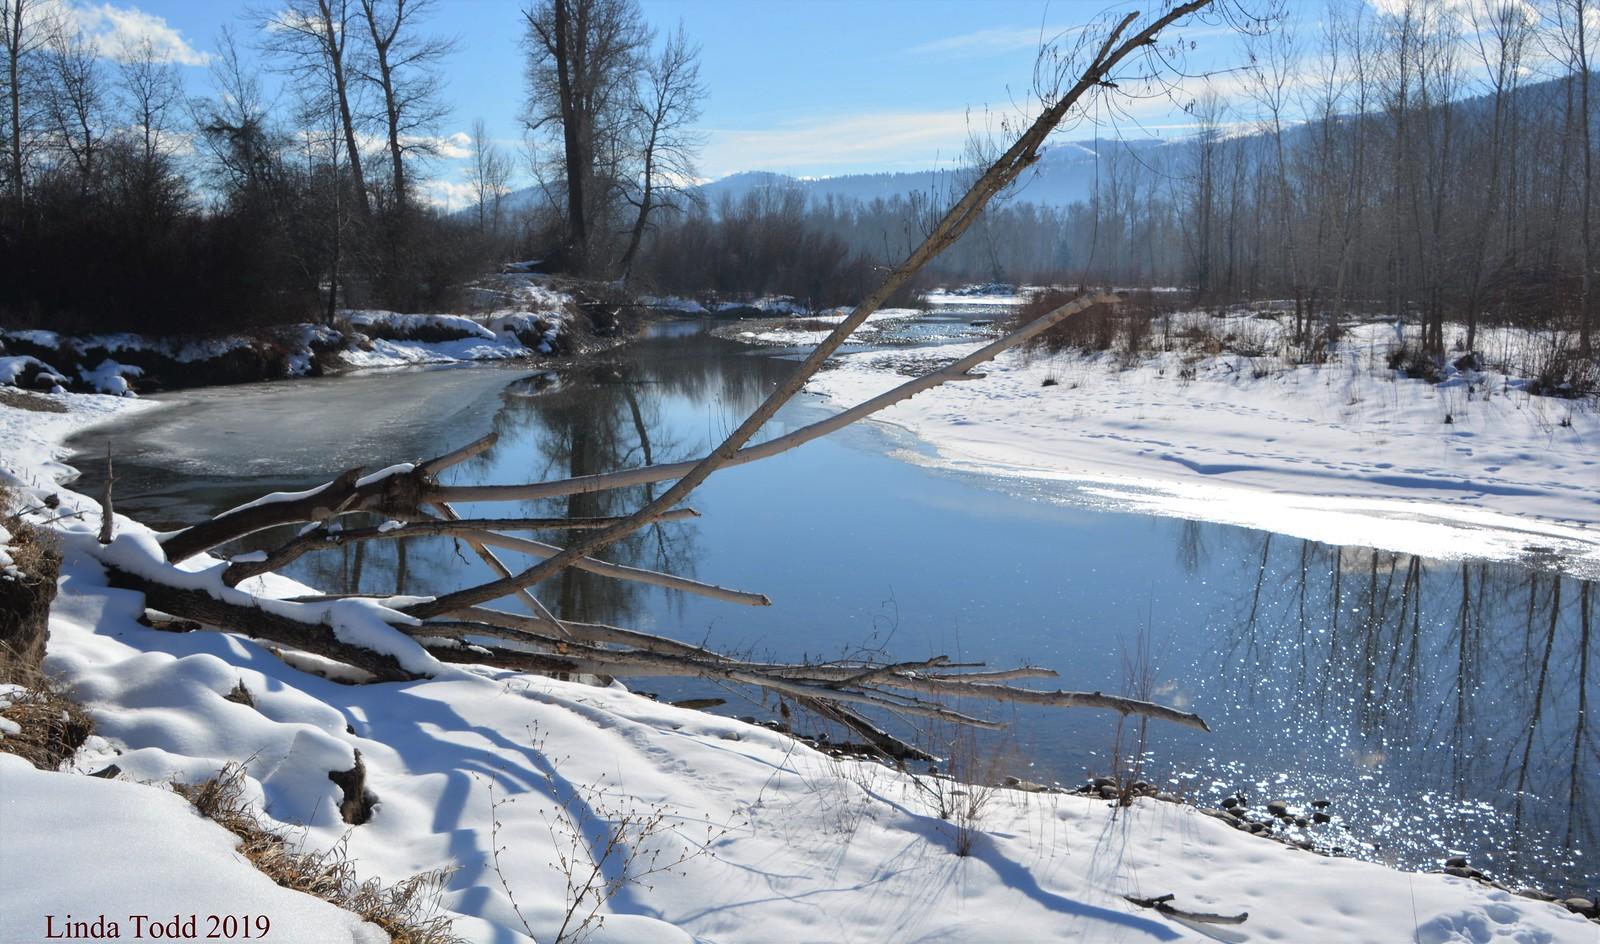 Council Groves Winterized....Explored Thank, Nikon D5200, AF-S DX Nikkor 18-300mm f/3.5-6.3G ED VR